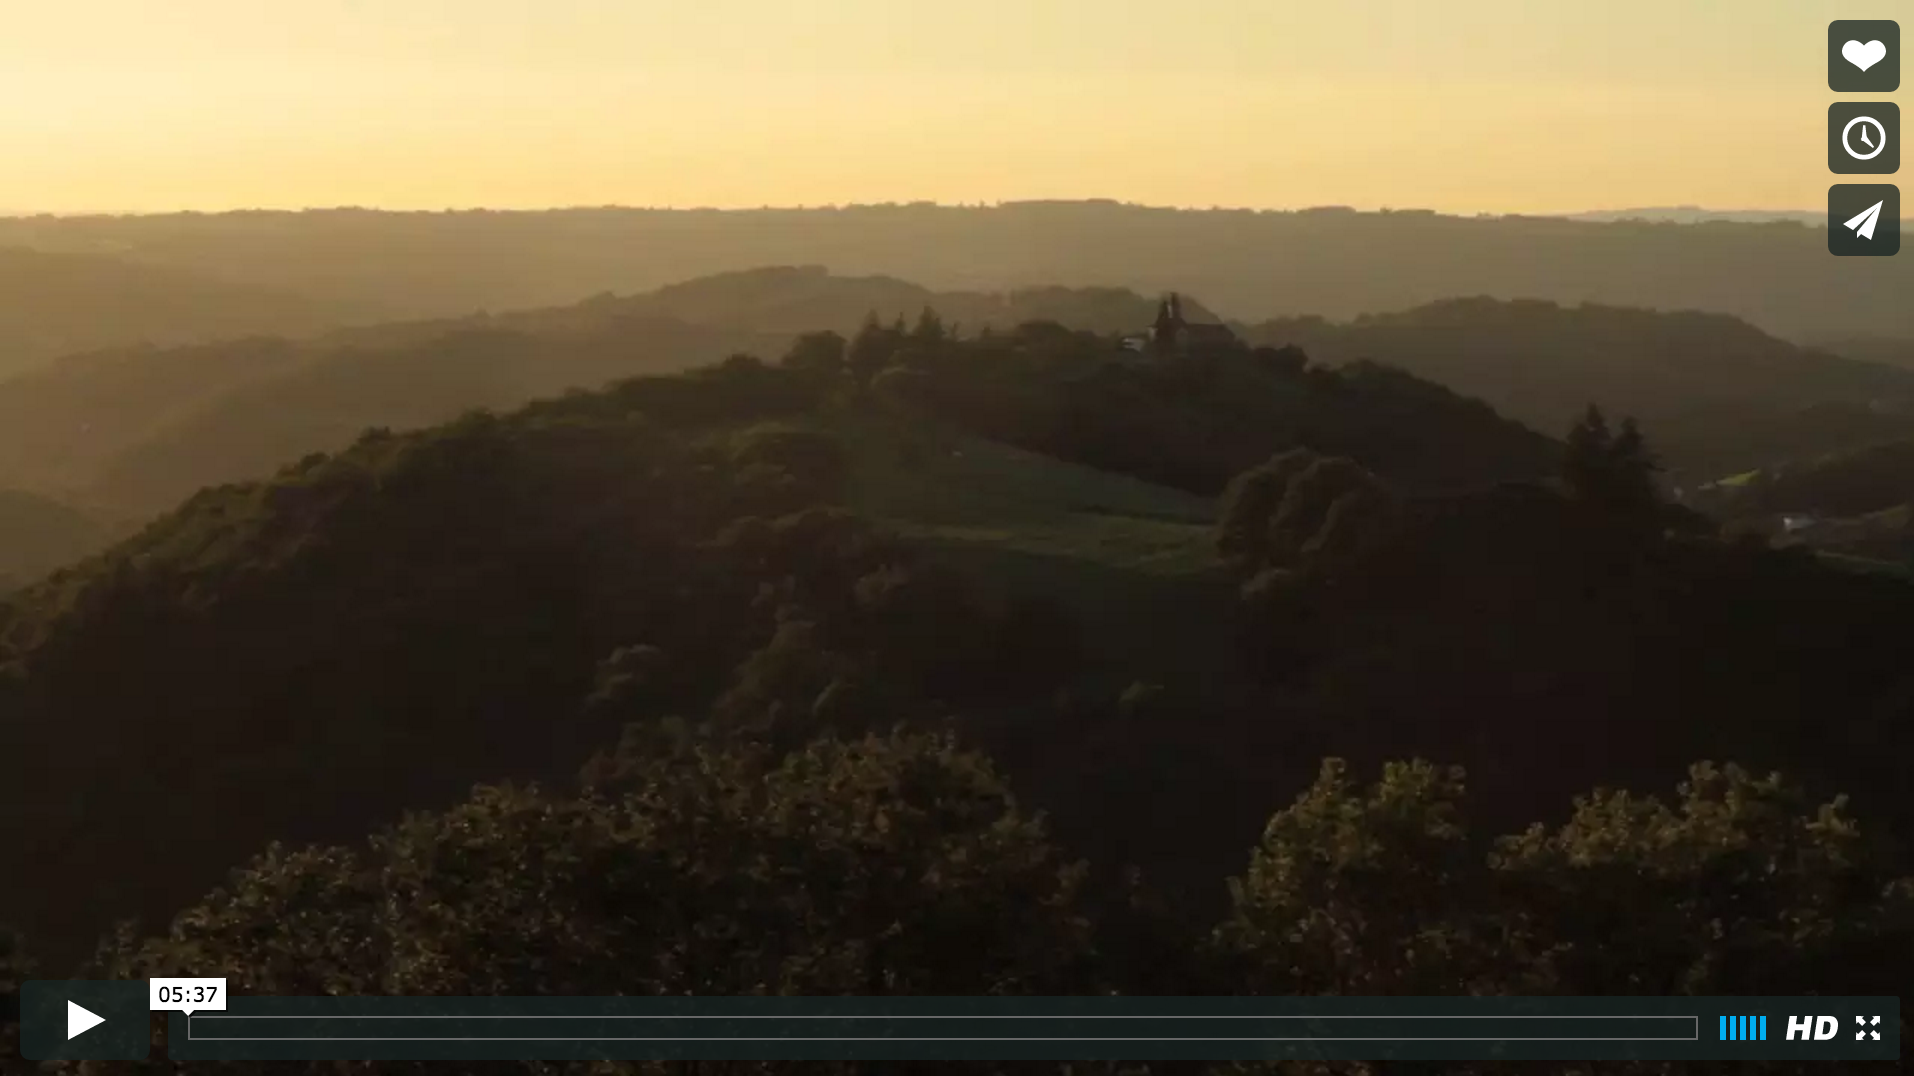 Vidéo, Château de Bournazel, Aveyron